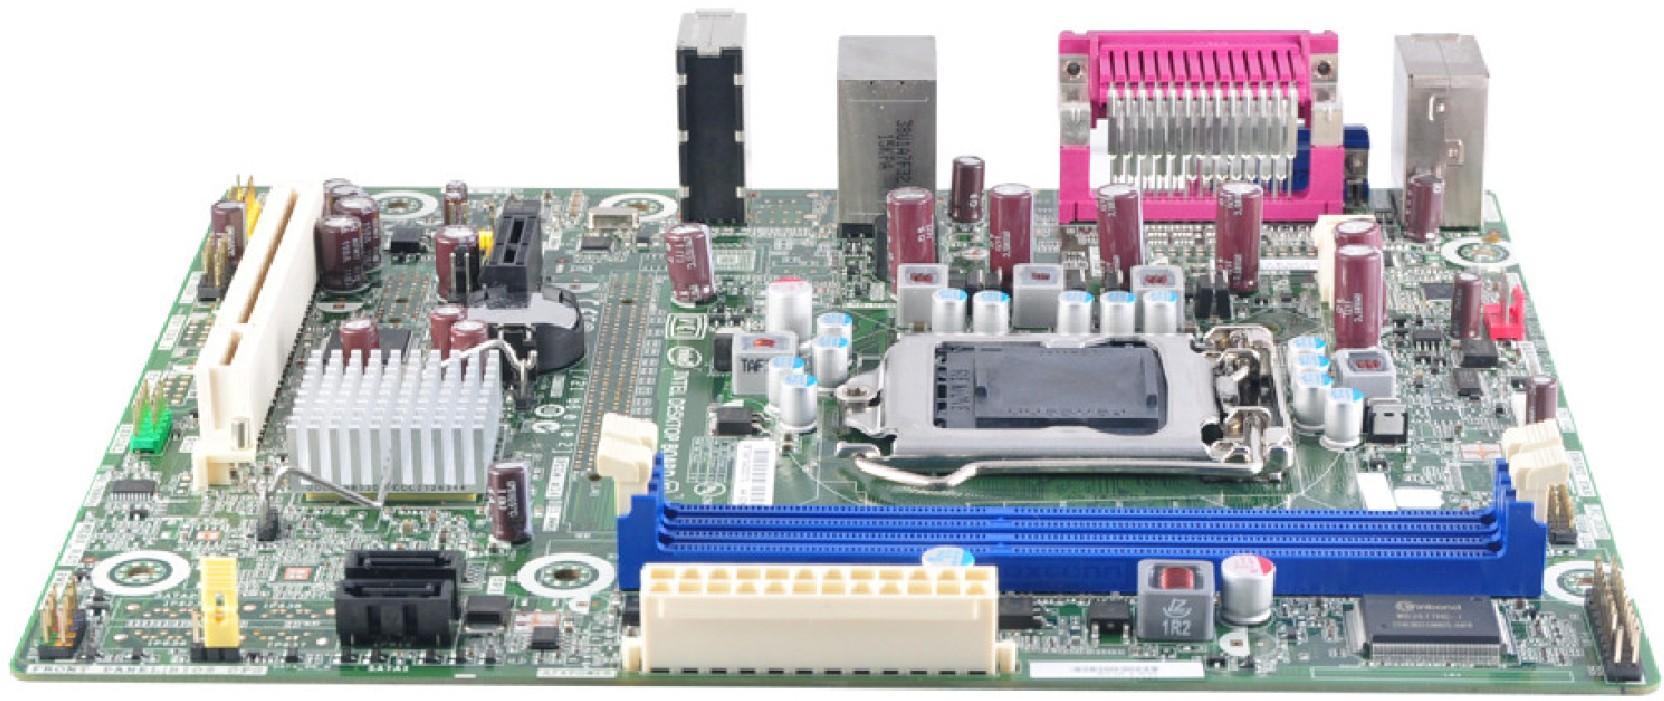 Intel Dh61sa Motherboard Original New Toshiba Integrated Circuit O 5200 1 Of See More Share